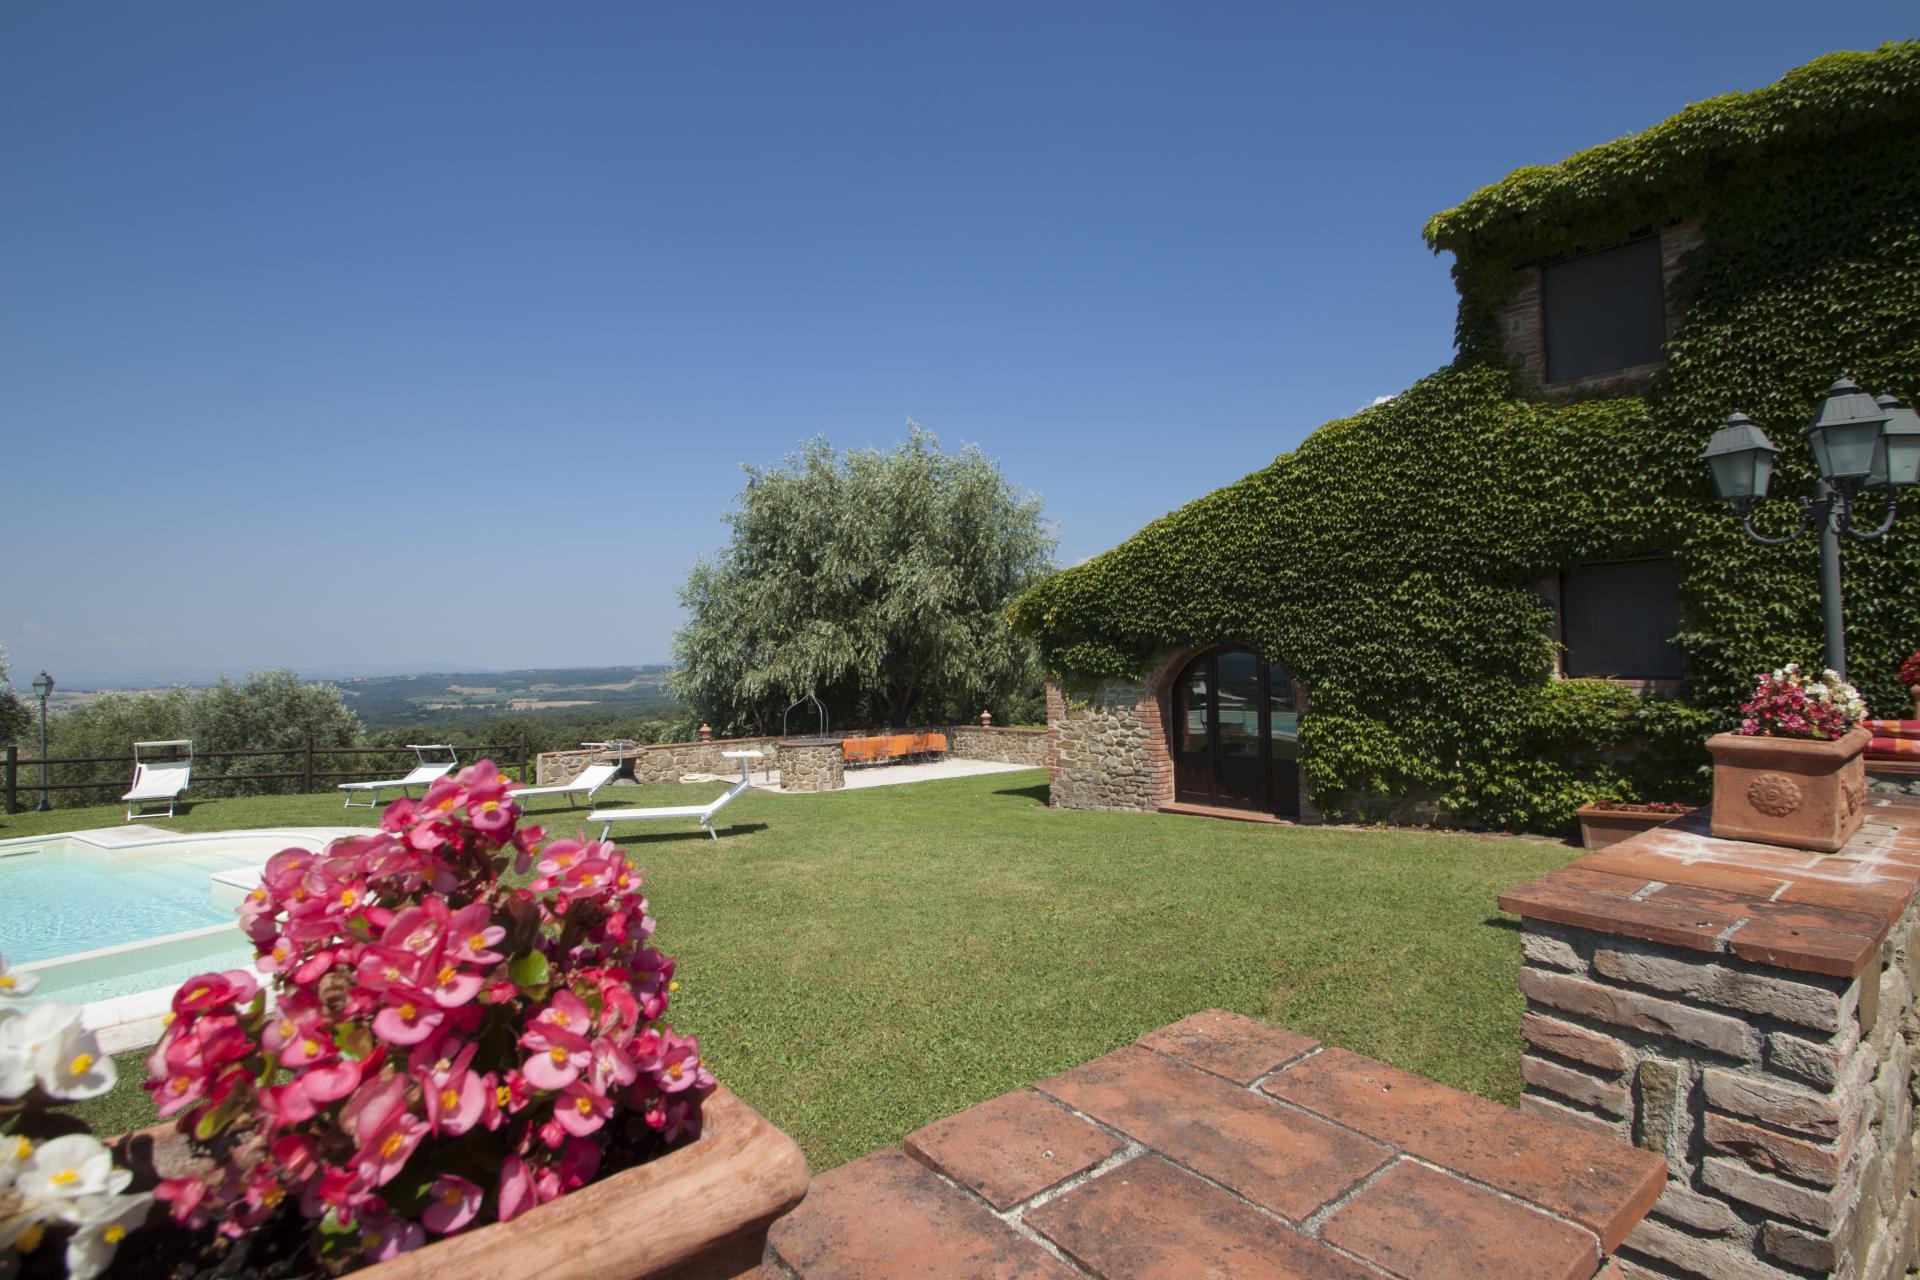 Villa exterior and pool, Casolare Toscano, Tuscany, La Turbie.